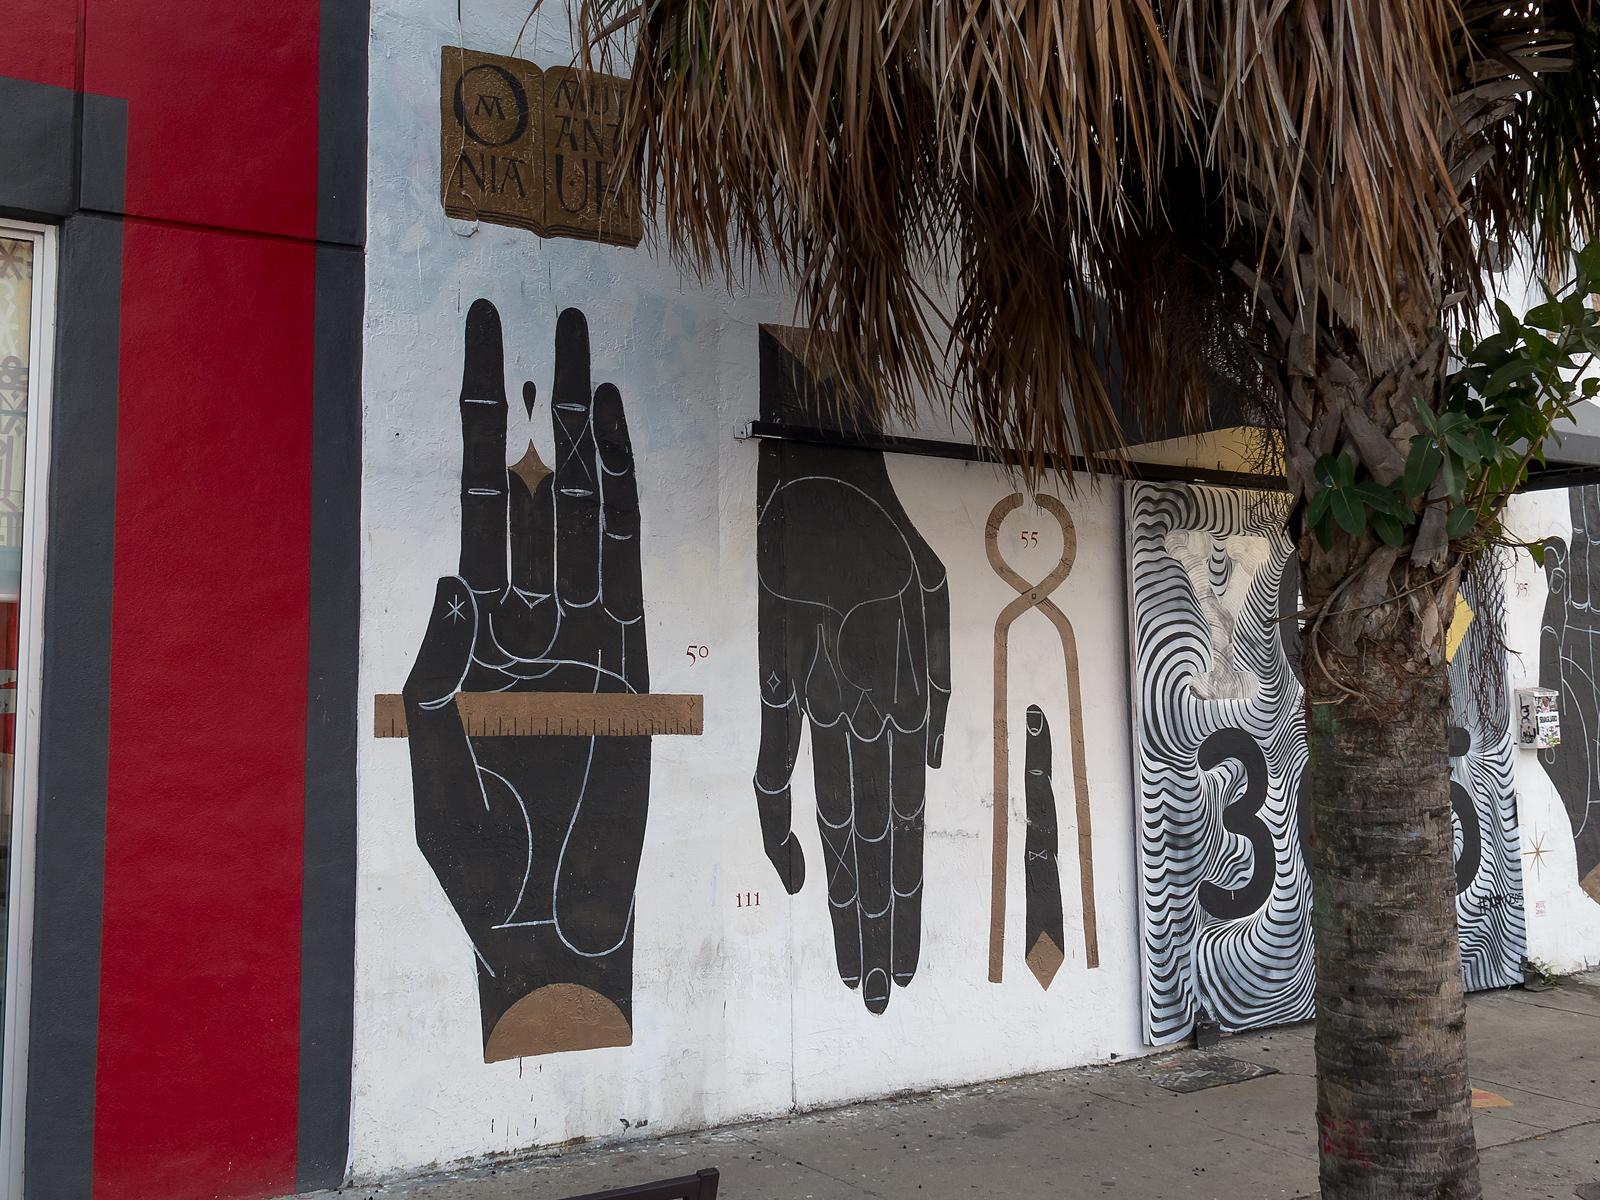 basik-new-mural-at-art-basel-2014-04